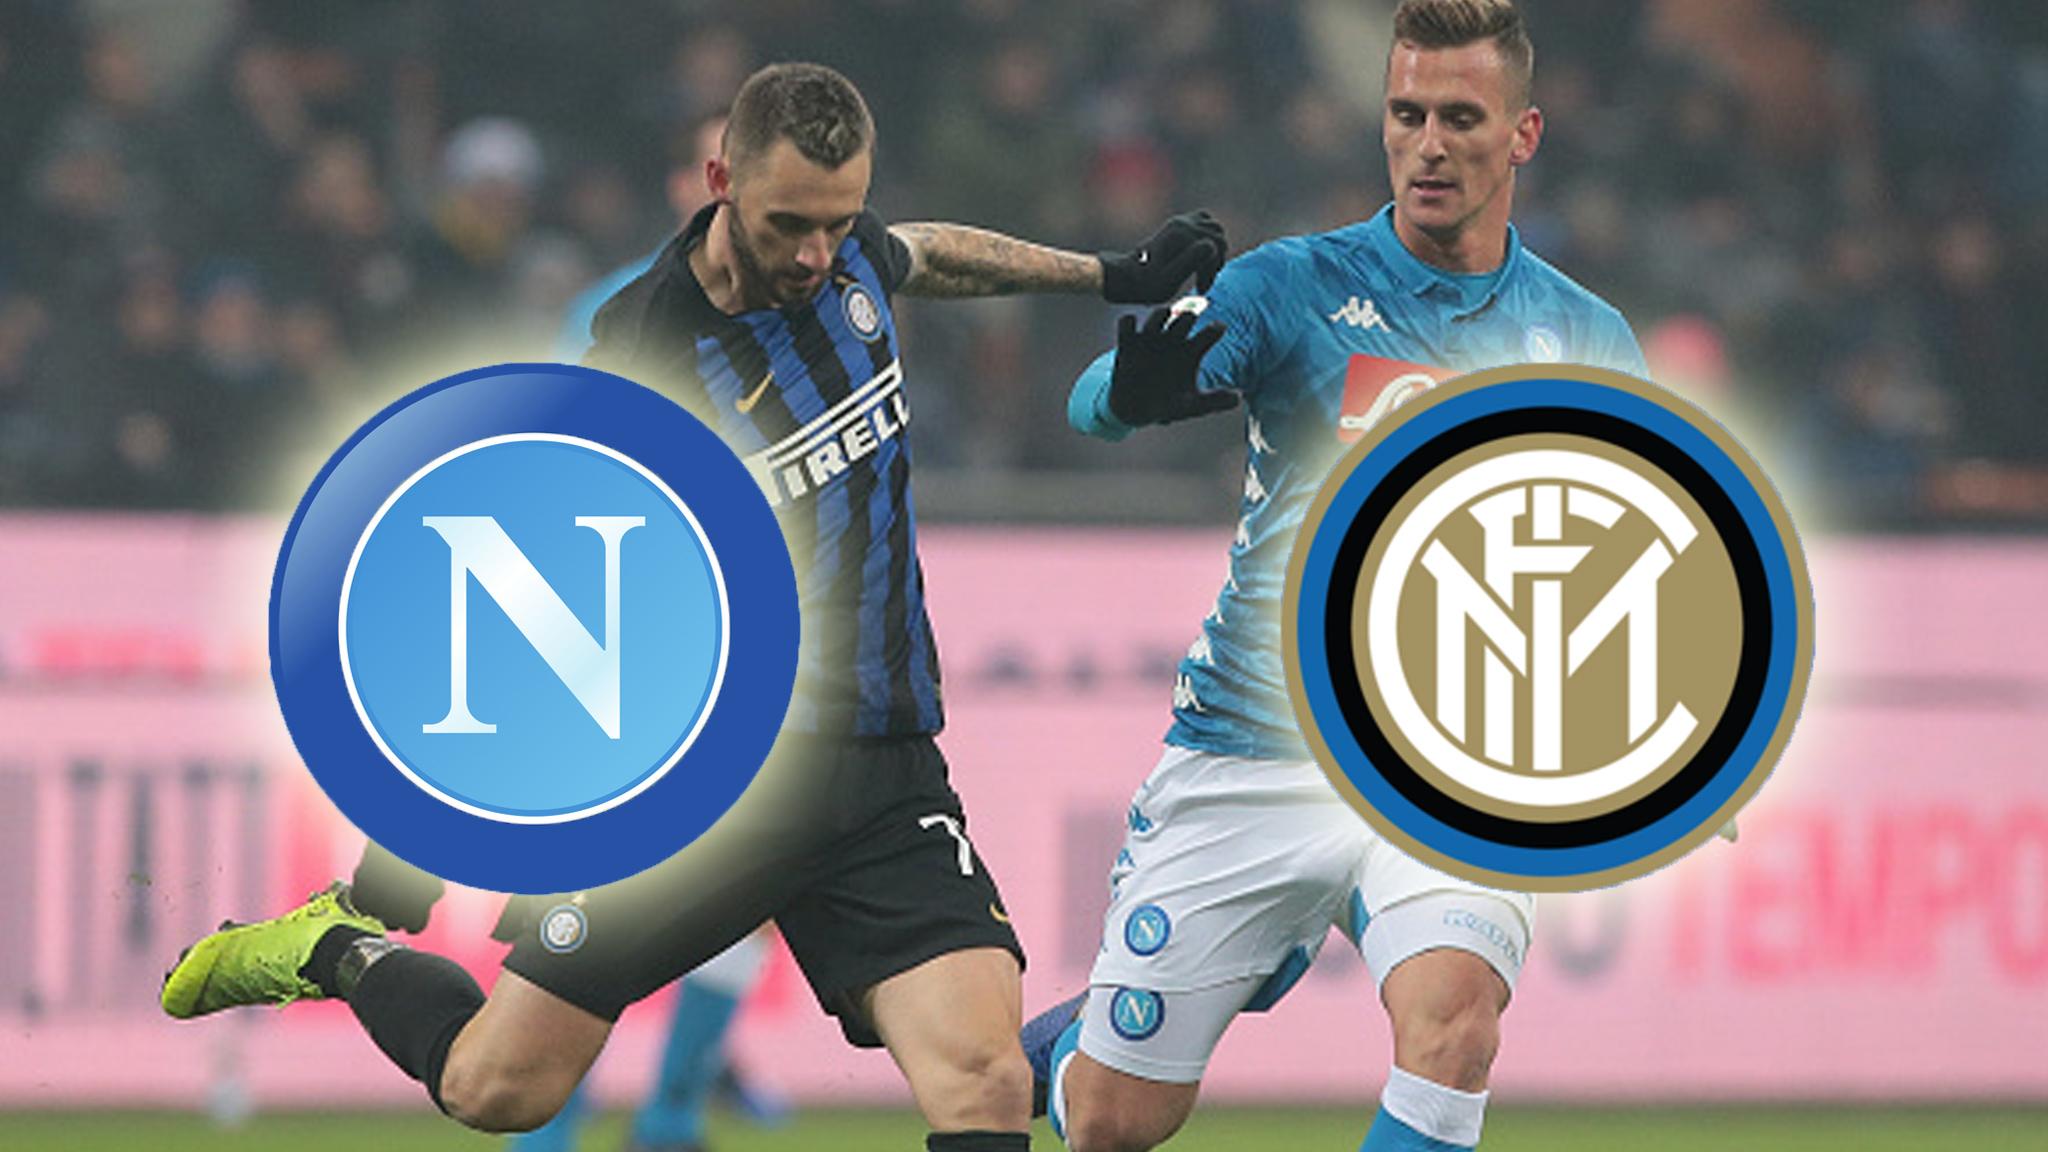 SSC Neapel Vs Inter Mailand Heute Im TV Und LIVE STREAM